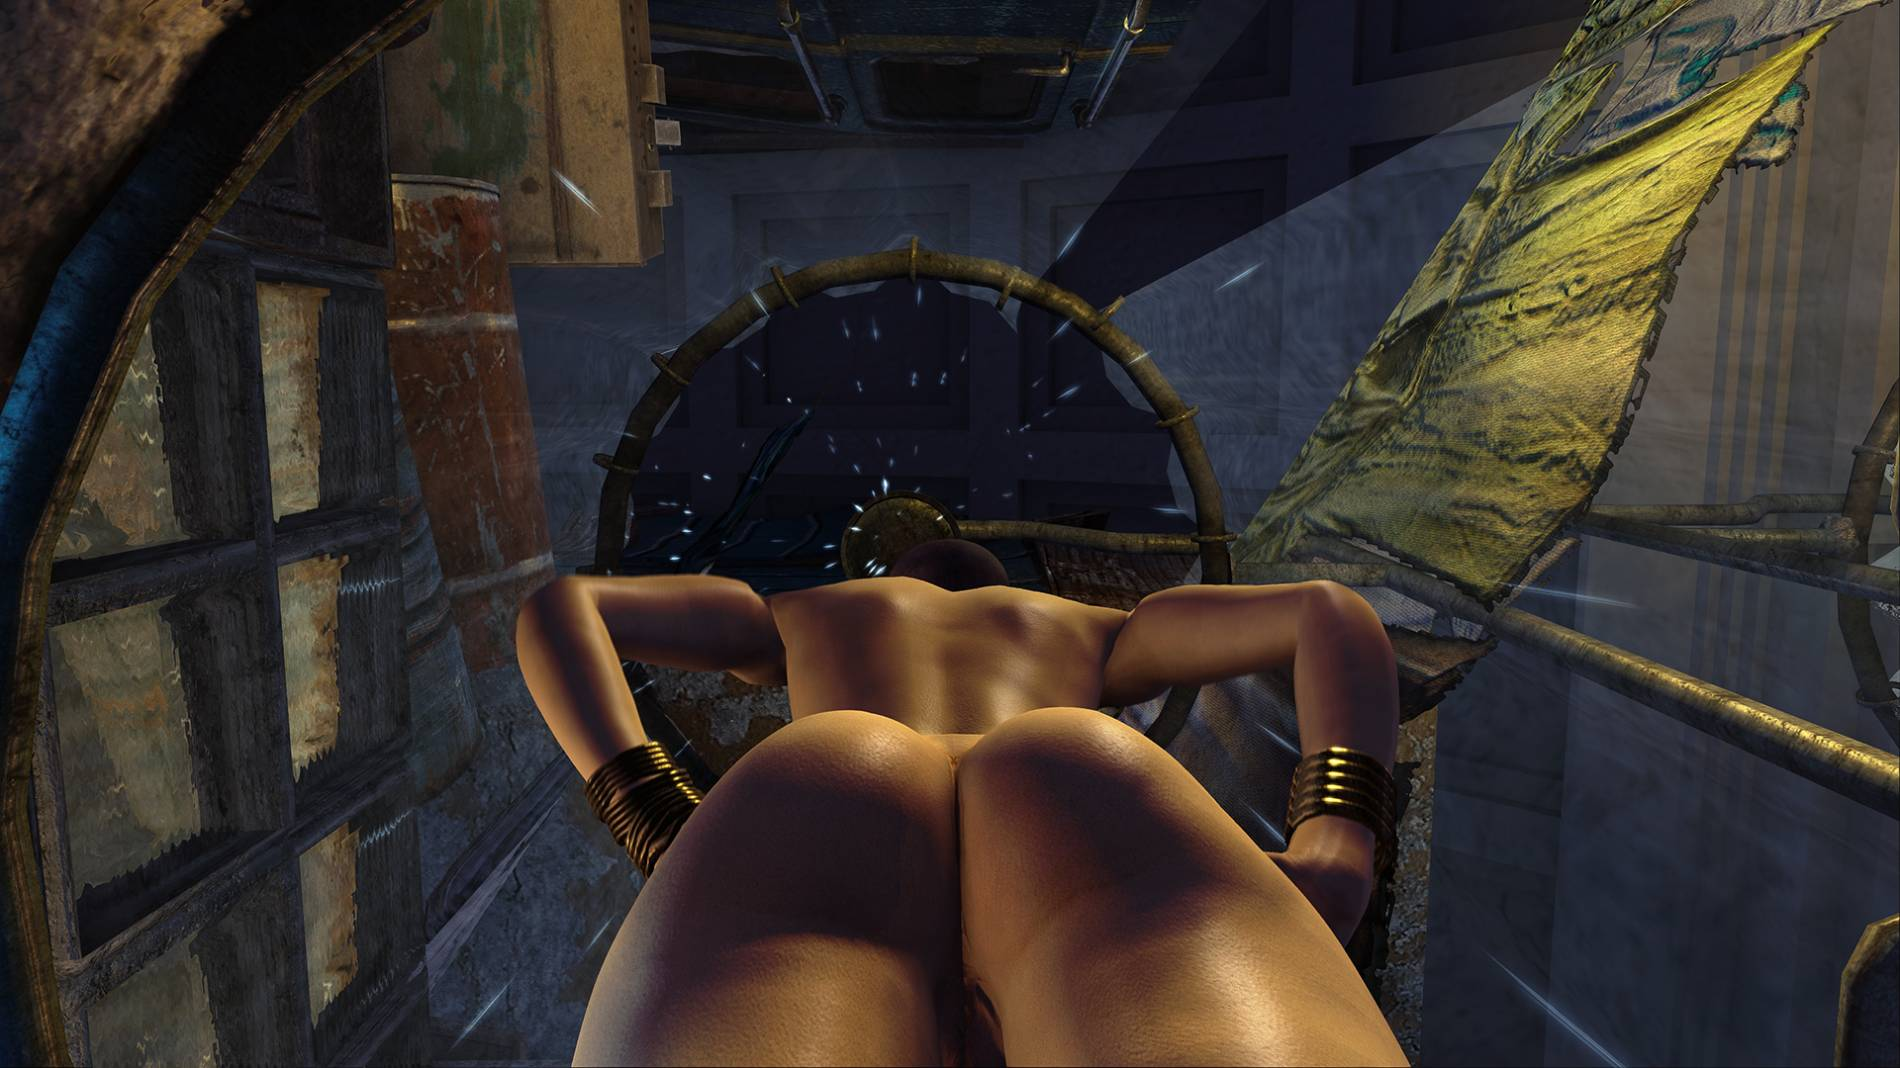 golie-metro-video